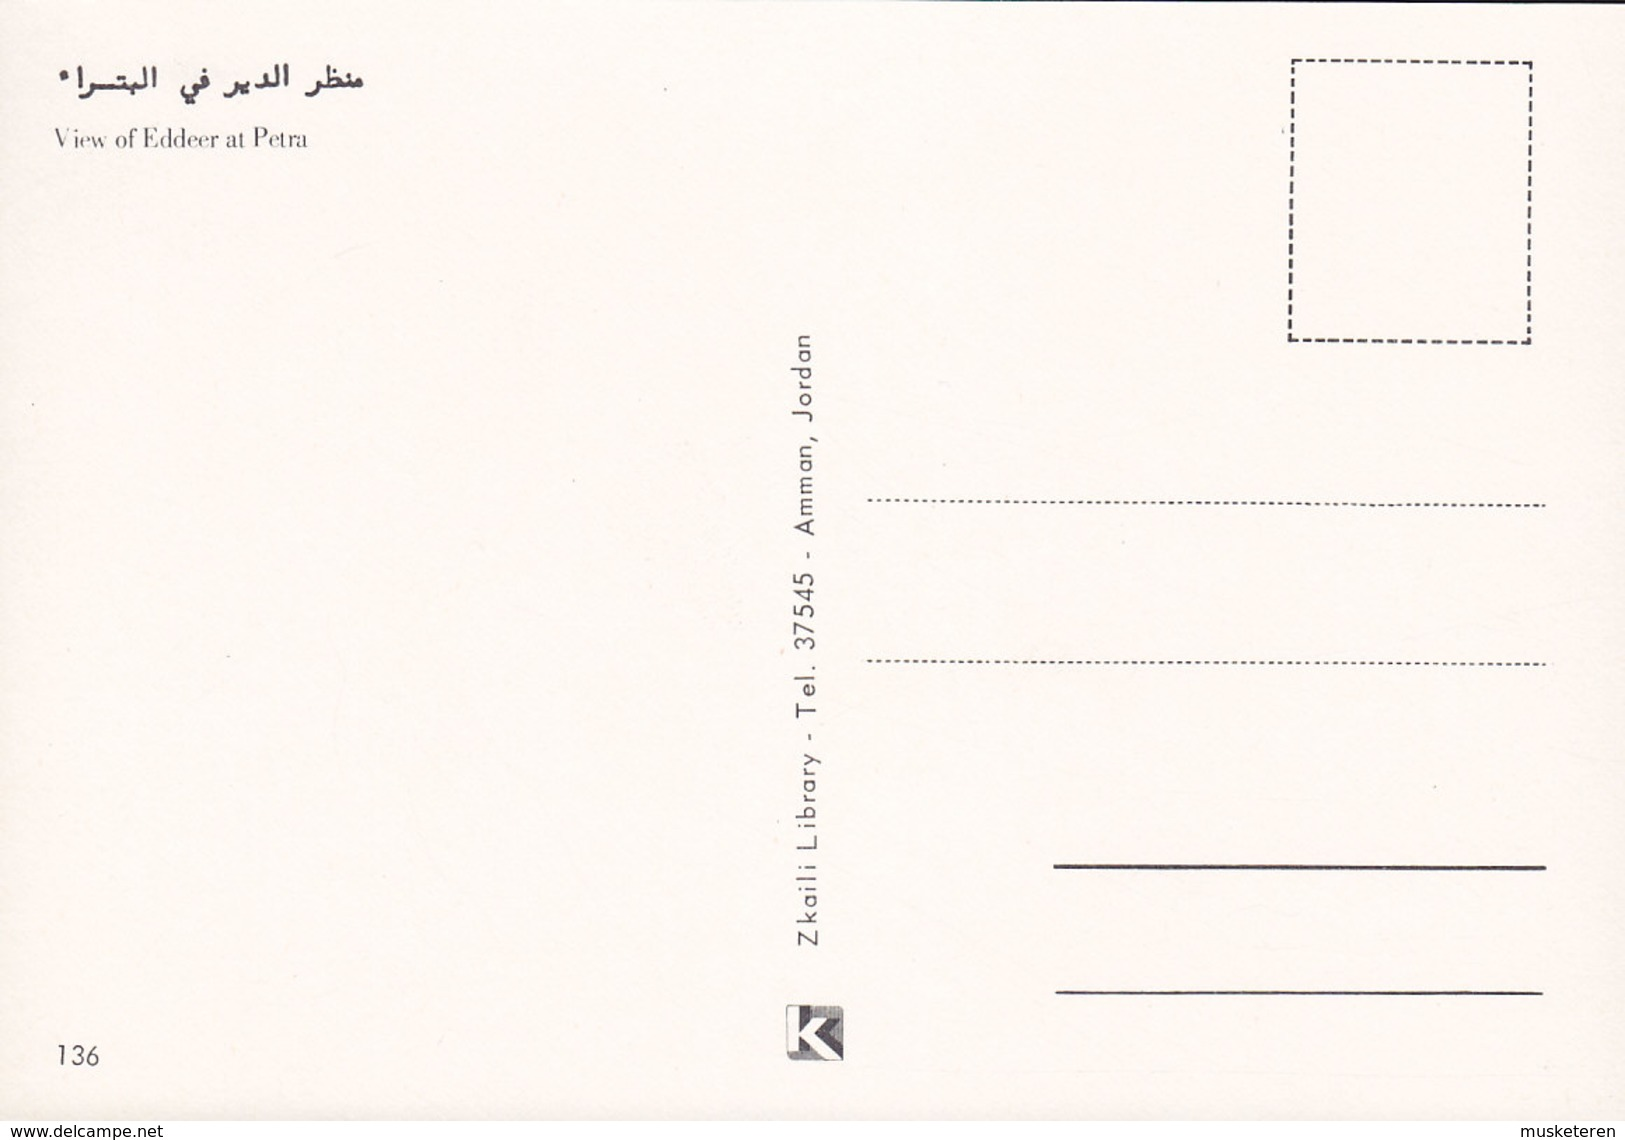 Jordan PPC View Of Eddeer At Petra Zkaili Library Amman Jordan (2 Scan) - Jordanien